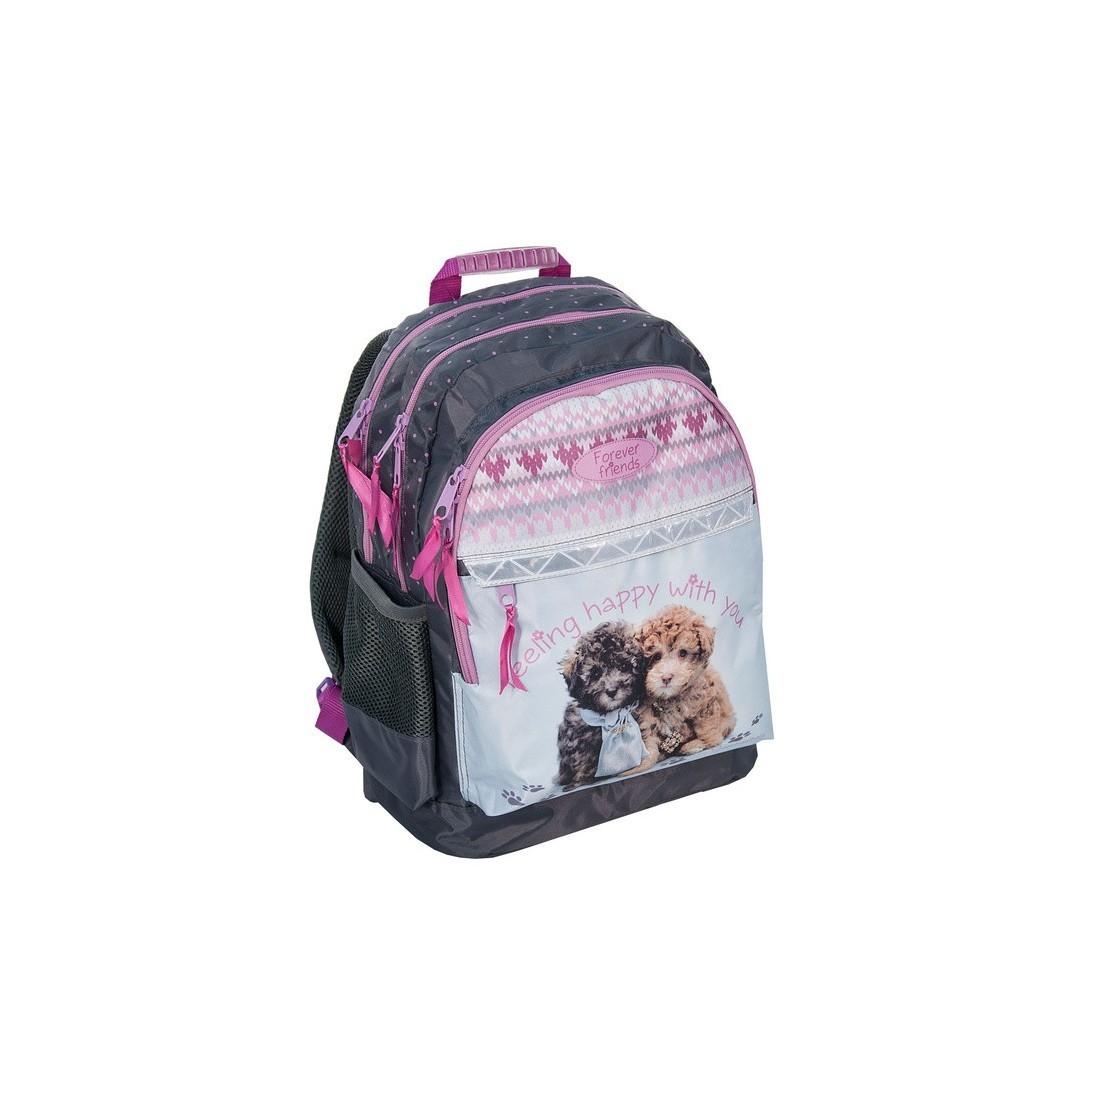 Plecak szkolny Rachael Hale z dwoma pieskami - plecak-tornister.pl